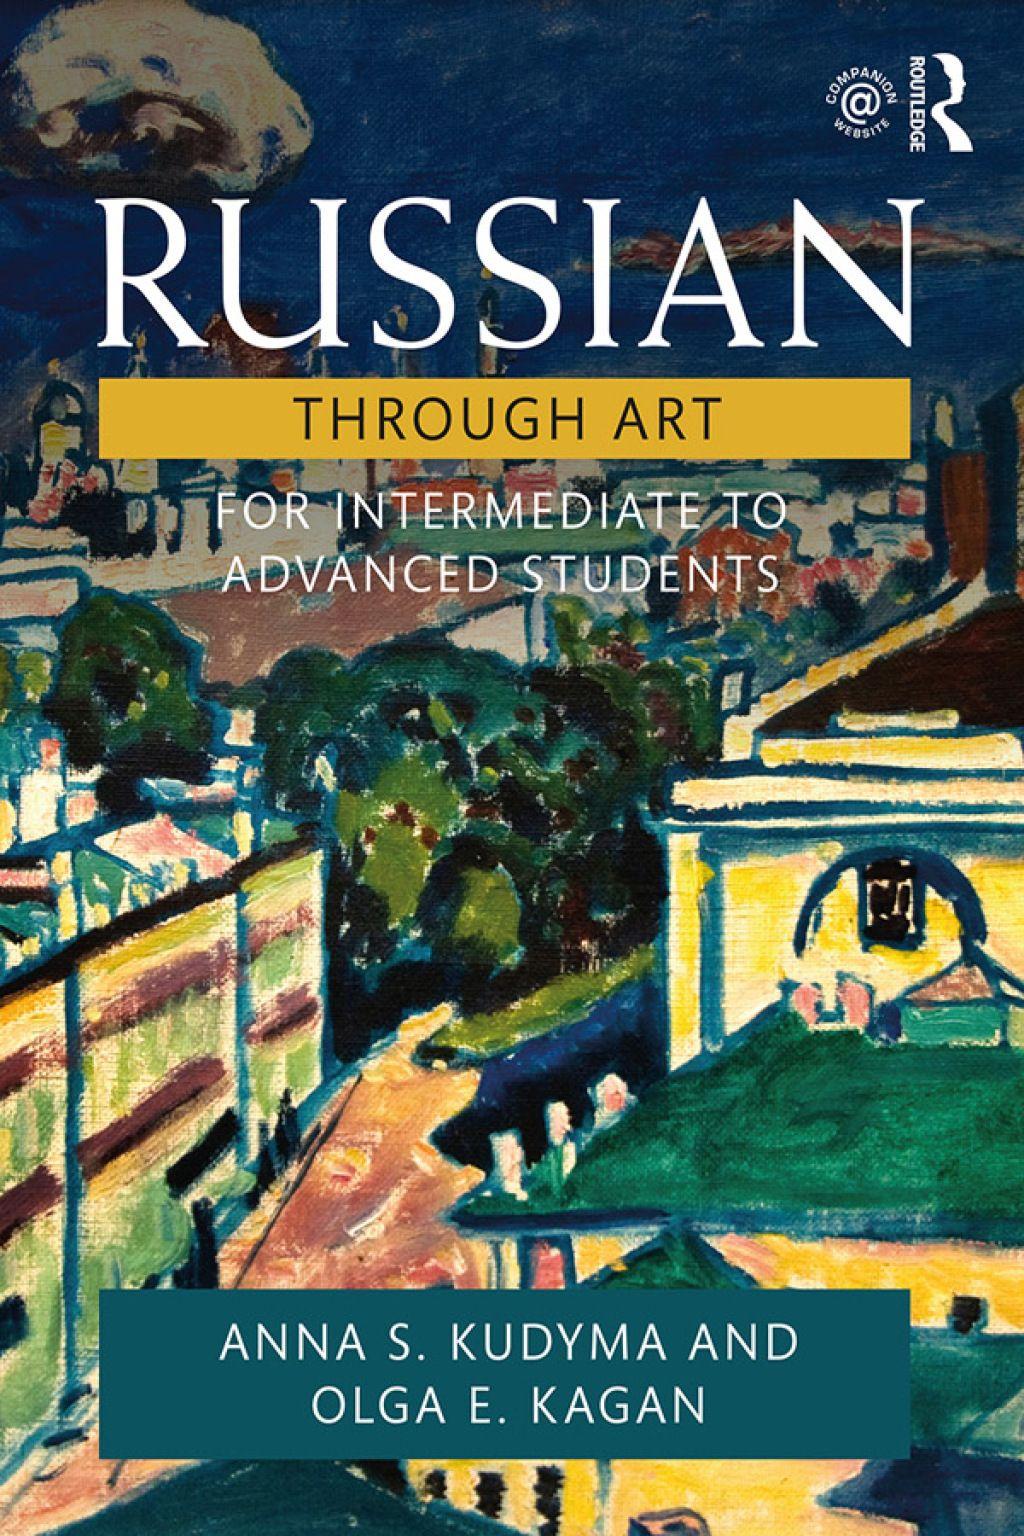 Russian Through Art (eBook Rental) Online lectures, Ebook